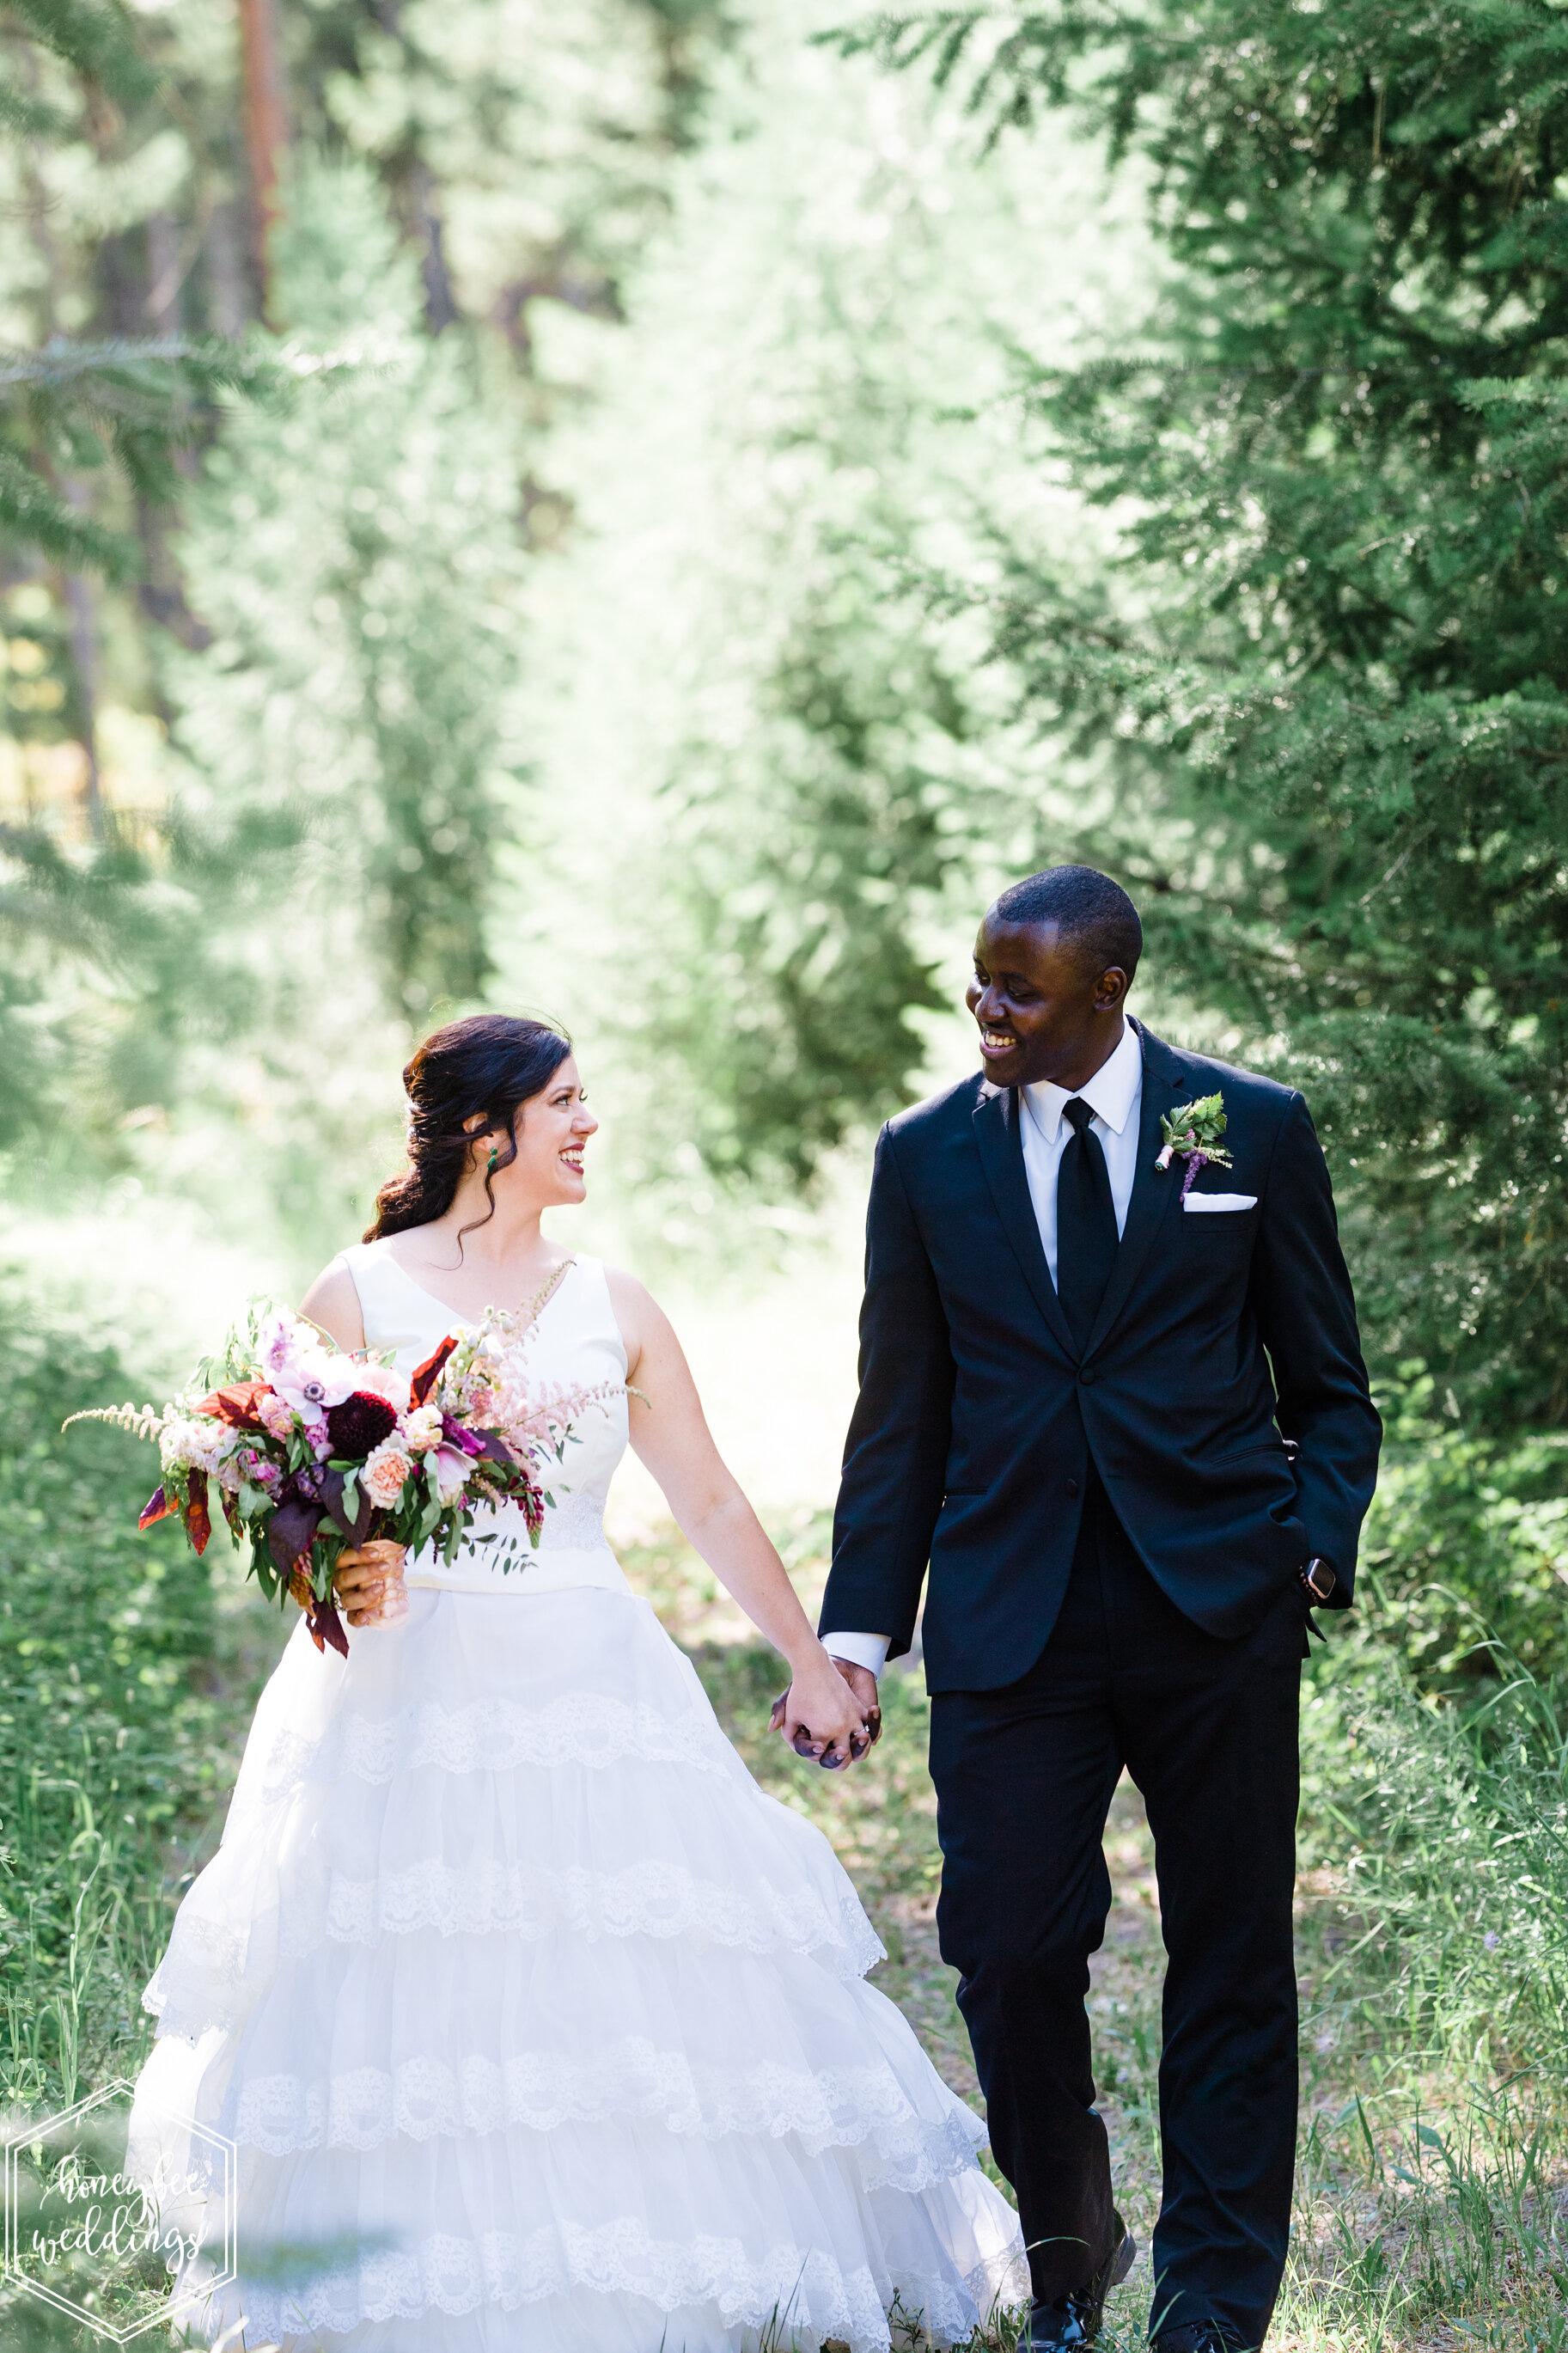 113White Raven Wedding_Montana Wedding Photographer_Rebekah & Likom_Honeybee Weddings_July 27, 2019-2370.jpg